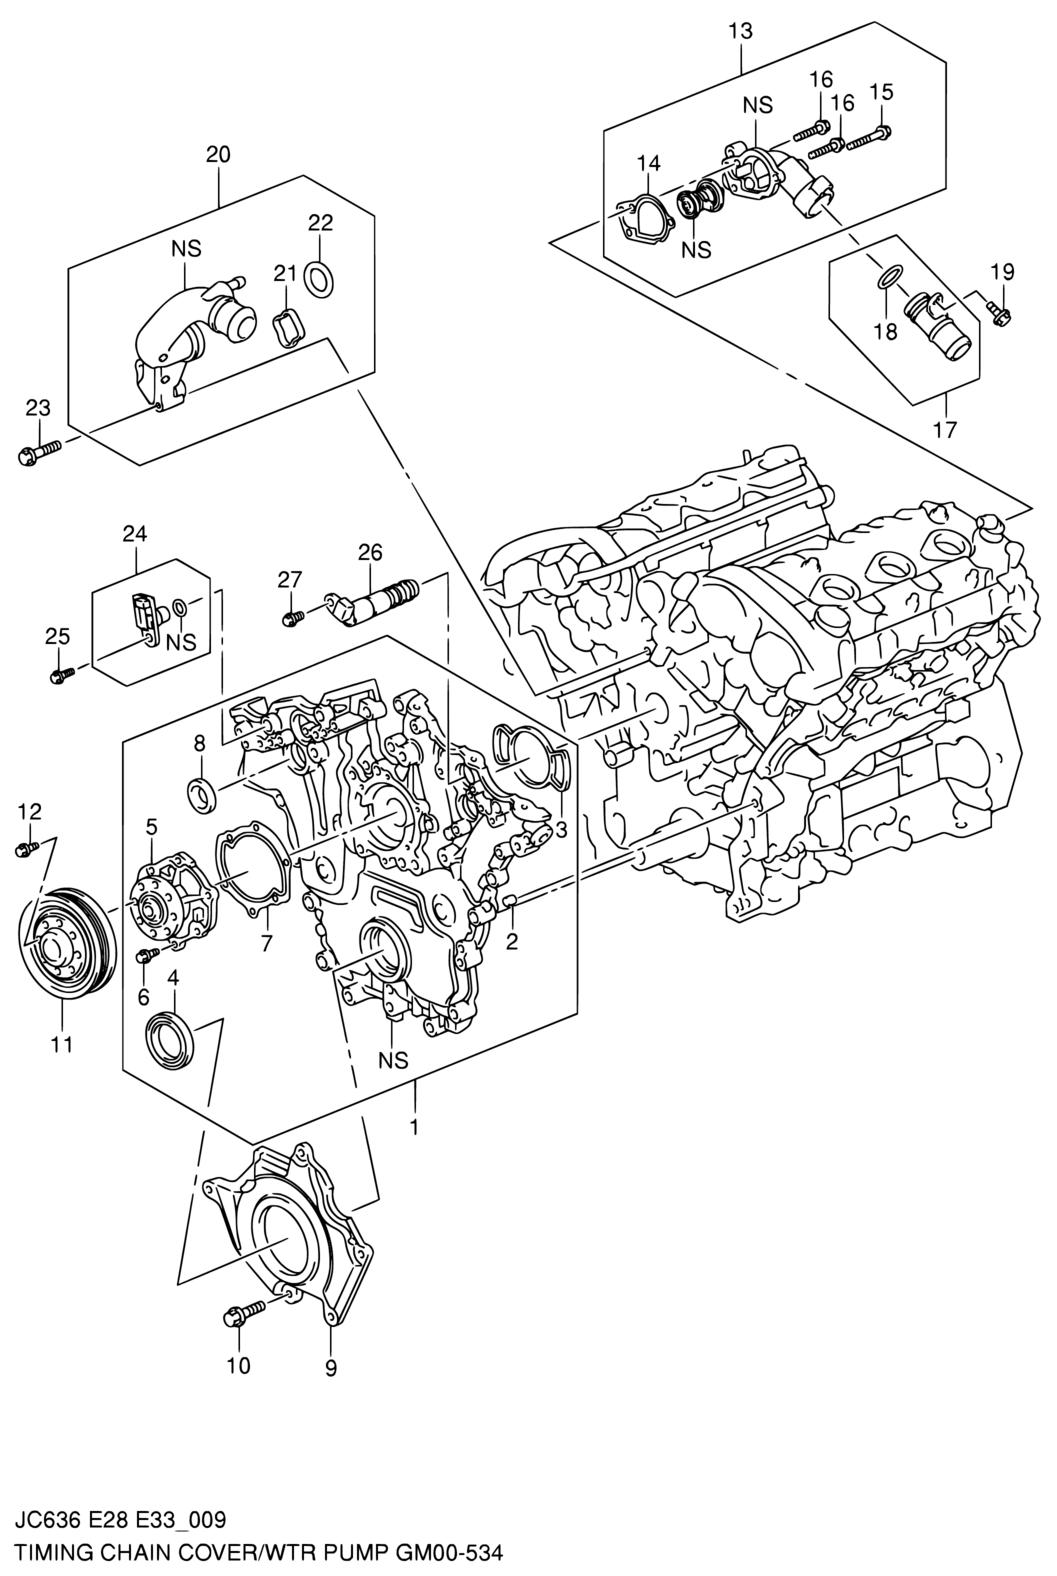 2008 Suzuki Xl7 Timing Chain Diagram Wiring Library Parts United States Grand Vitara Xl 7 Jc636 E28e33my Engine 9